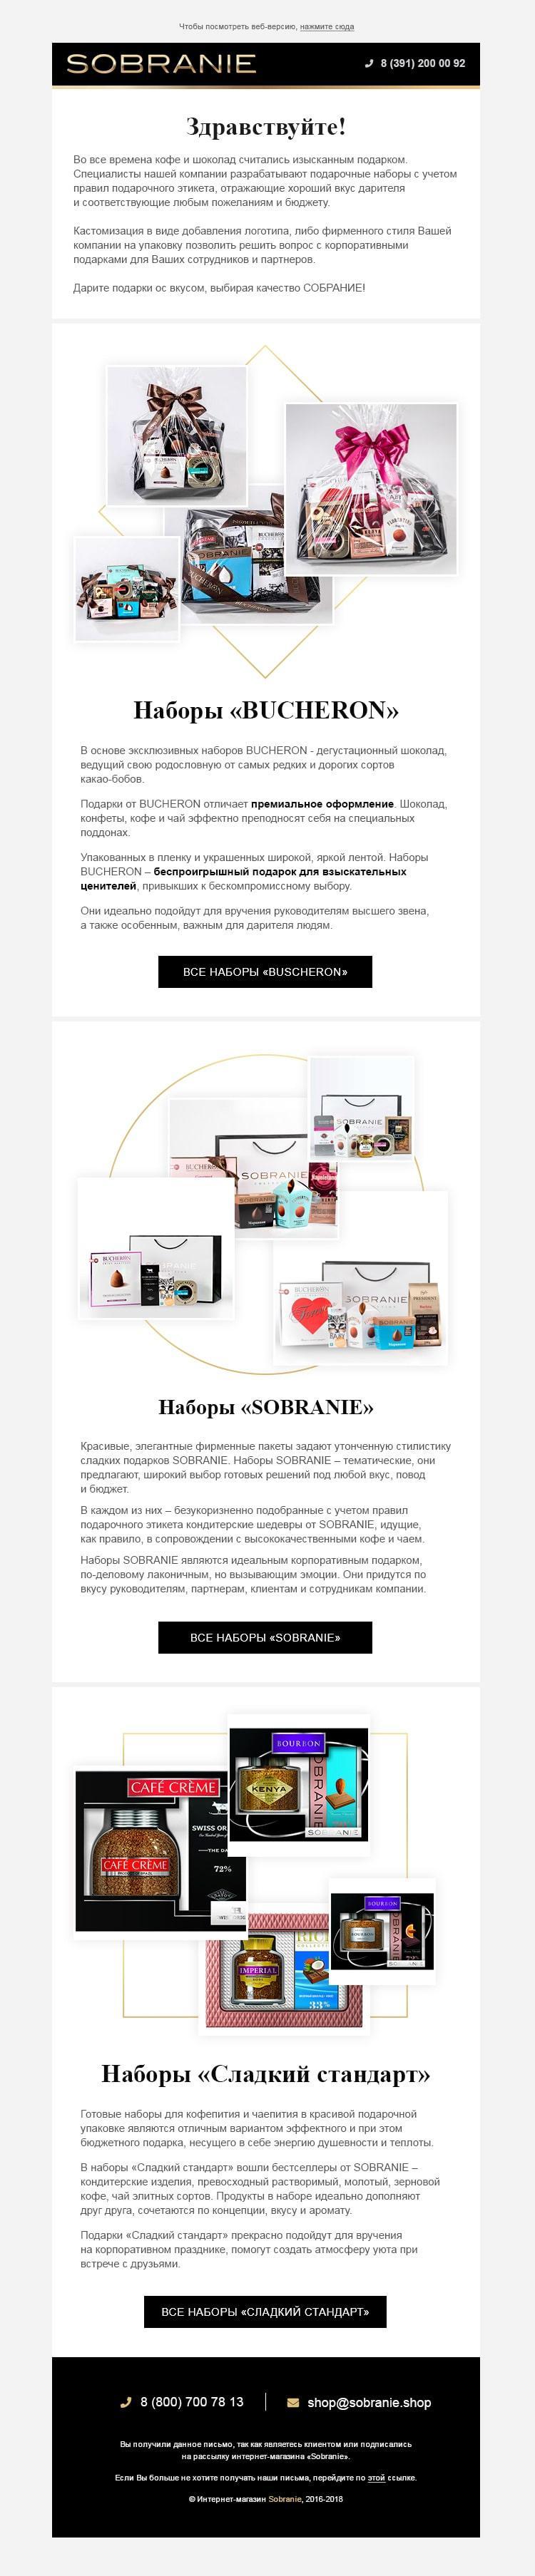 Знакомство с наборами подарков SOBRANIE: